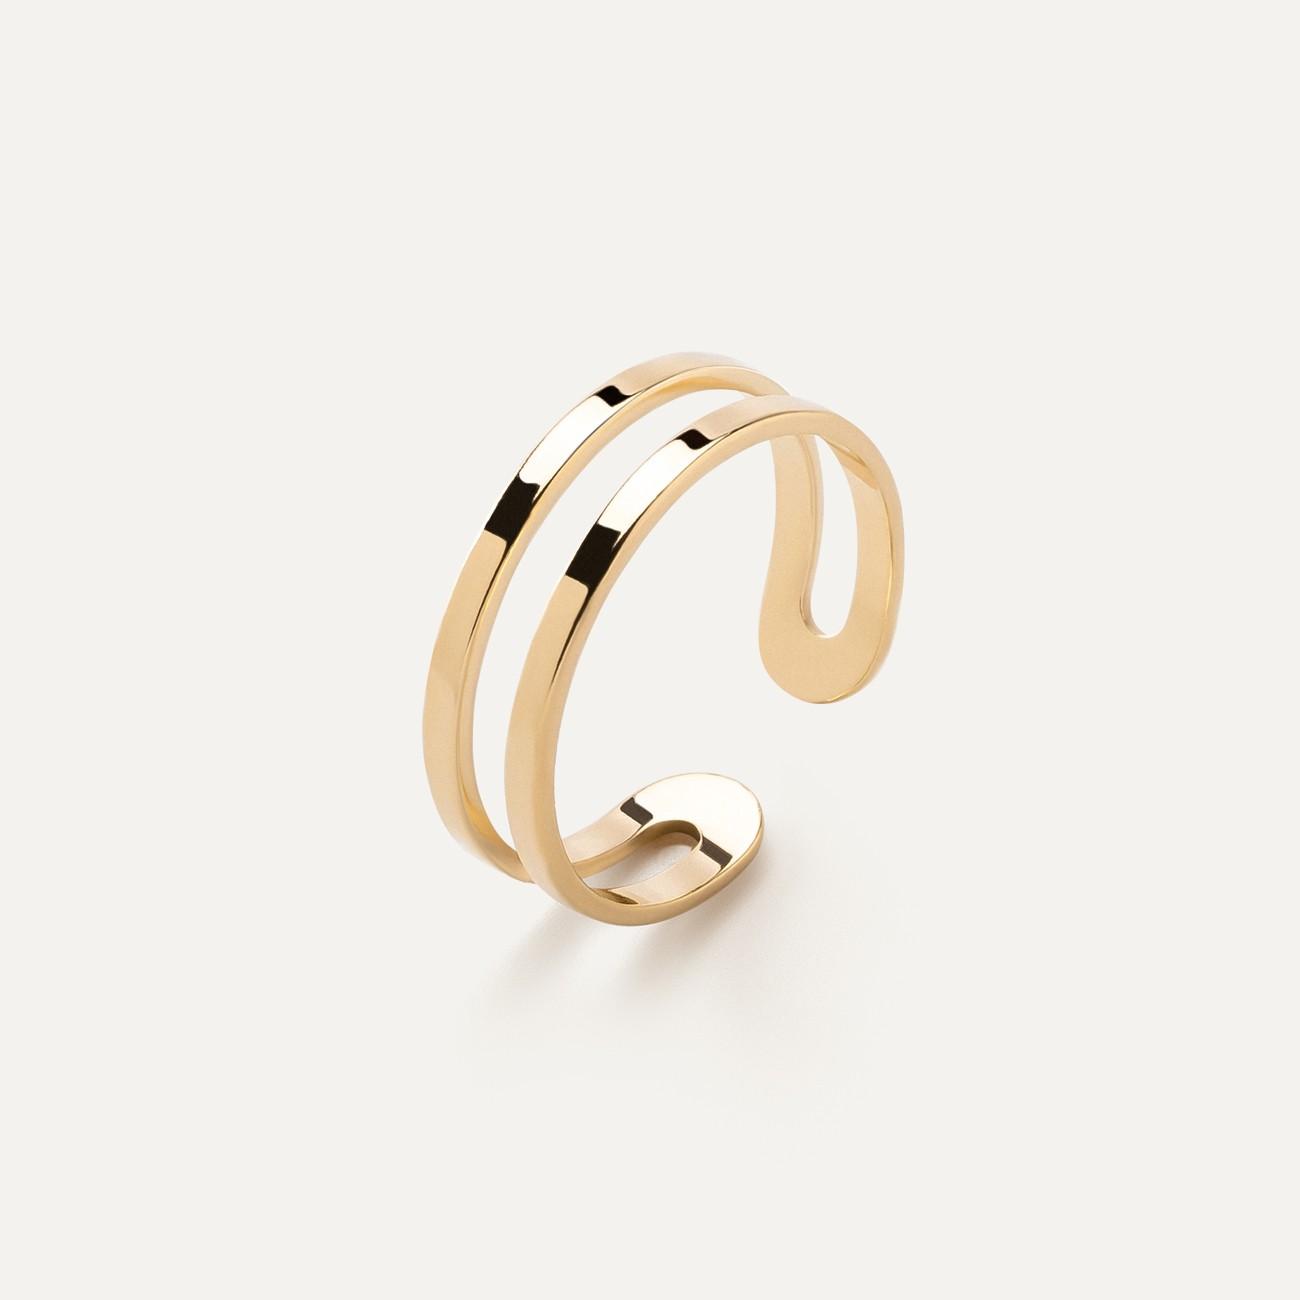 Srebrny pierścionek na początek palca, srebro 925